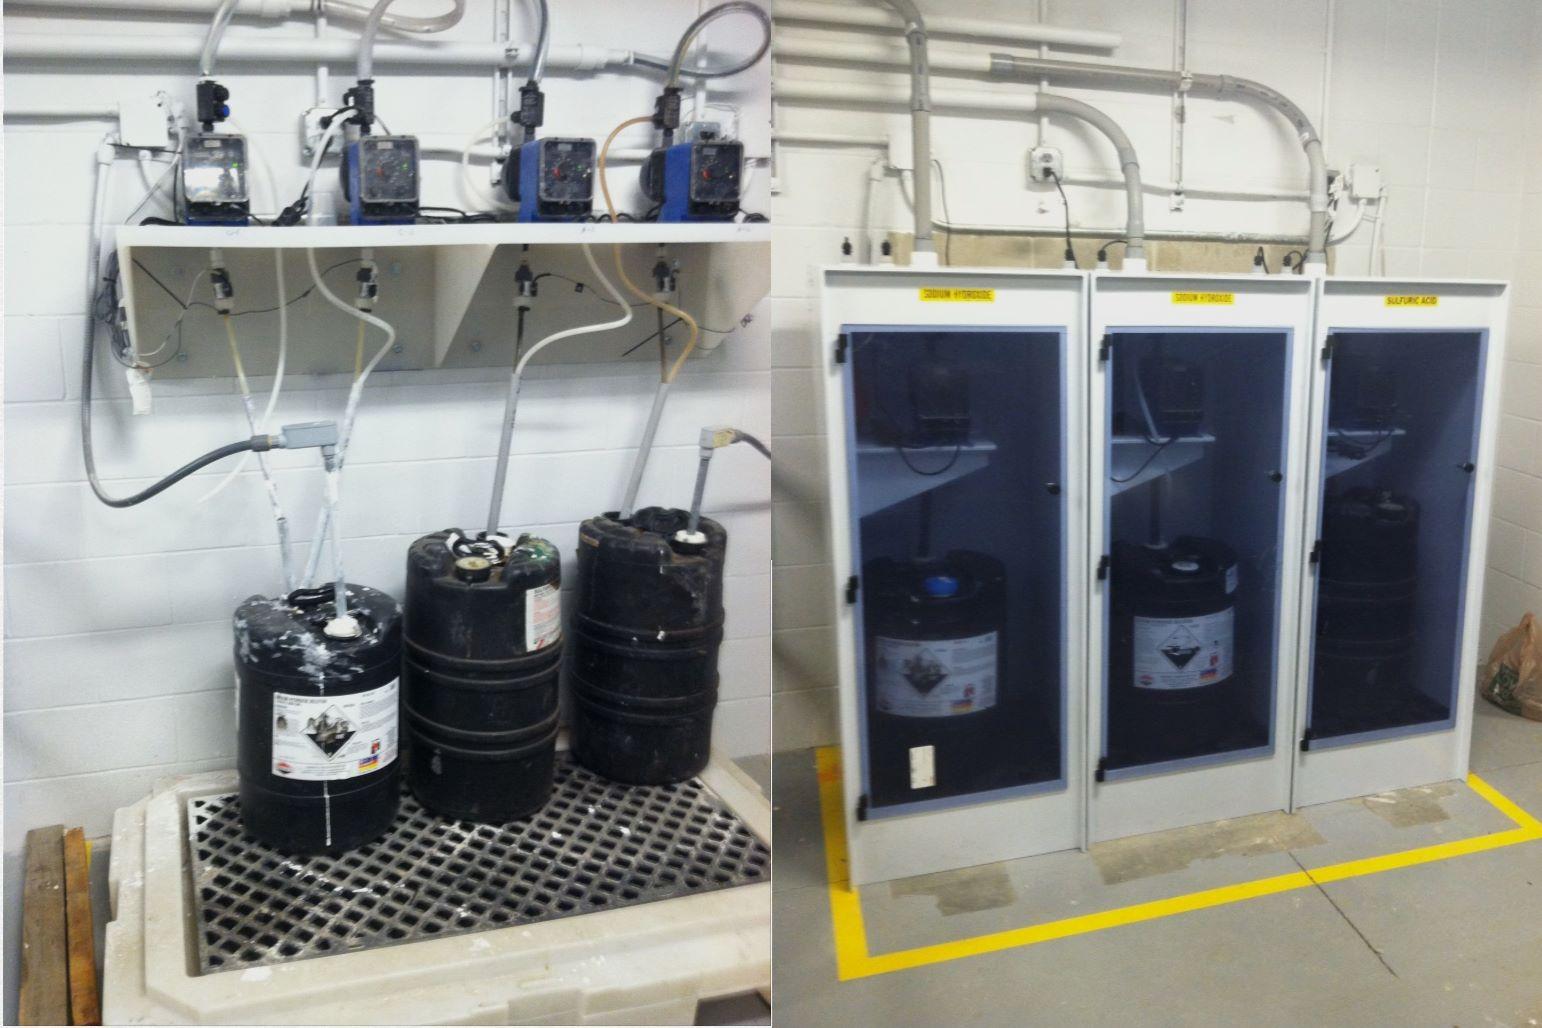 Chem cabinet comparison.jpg